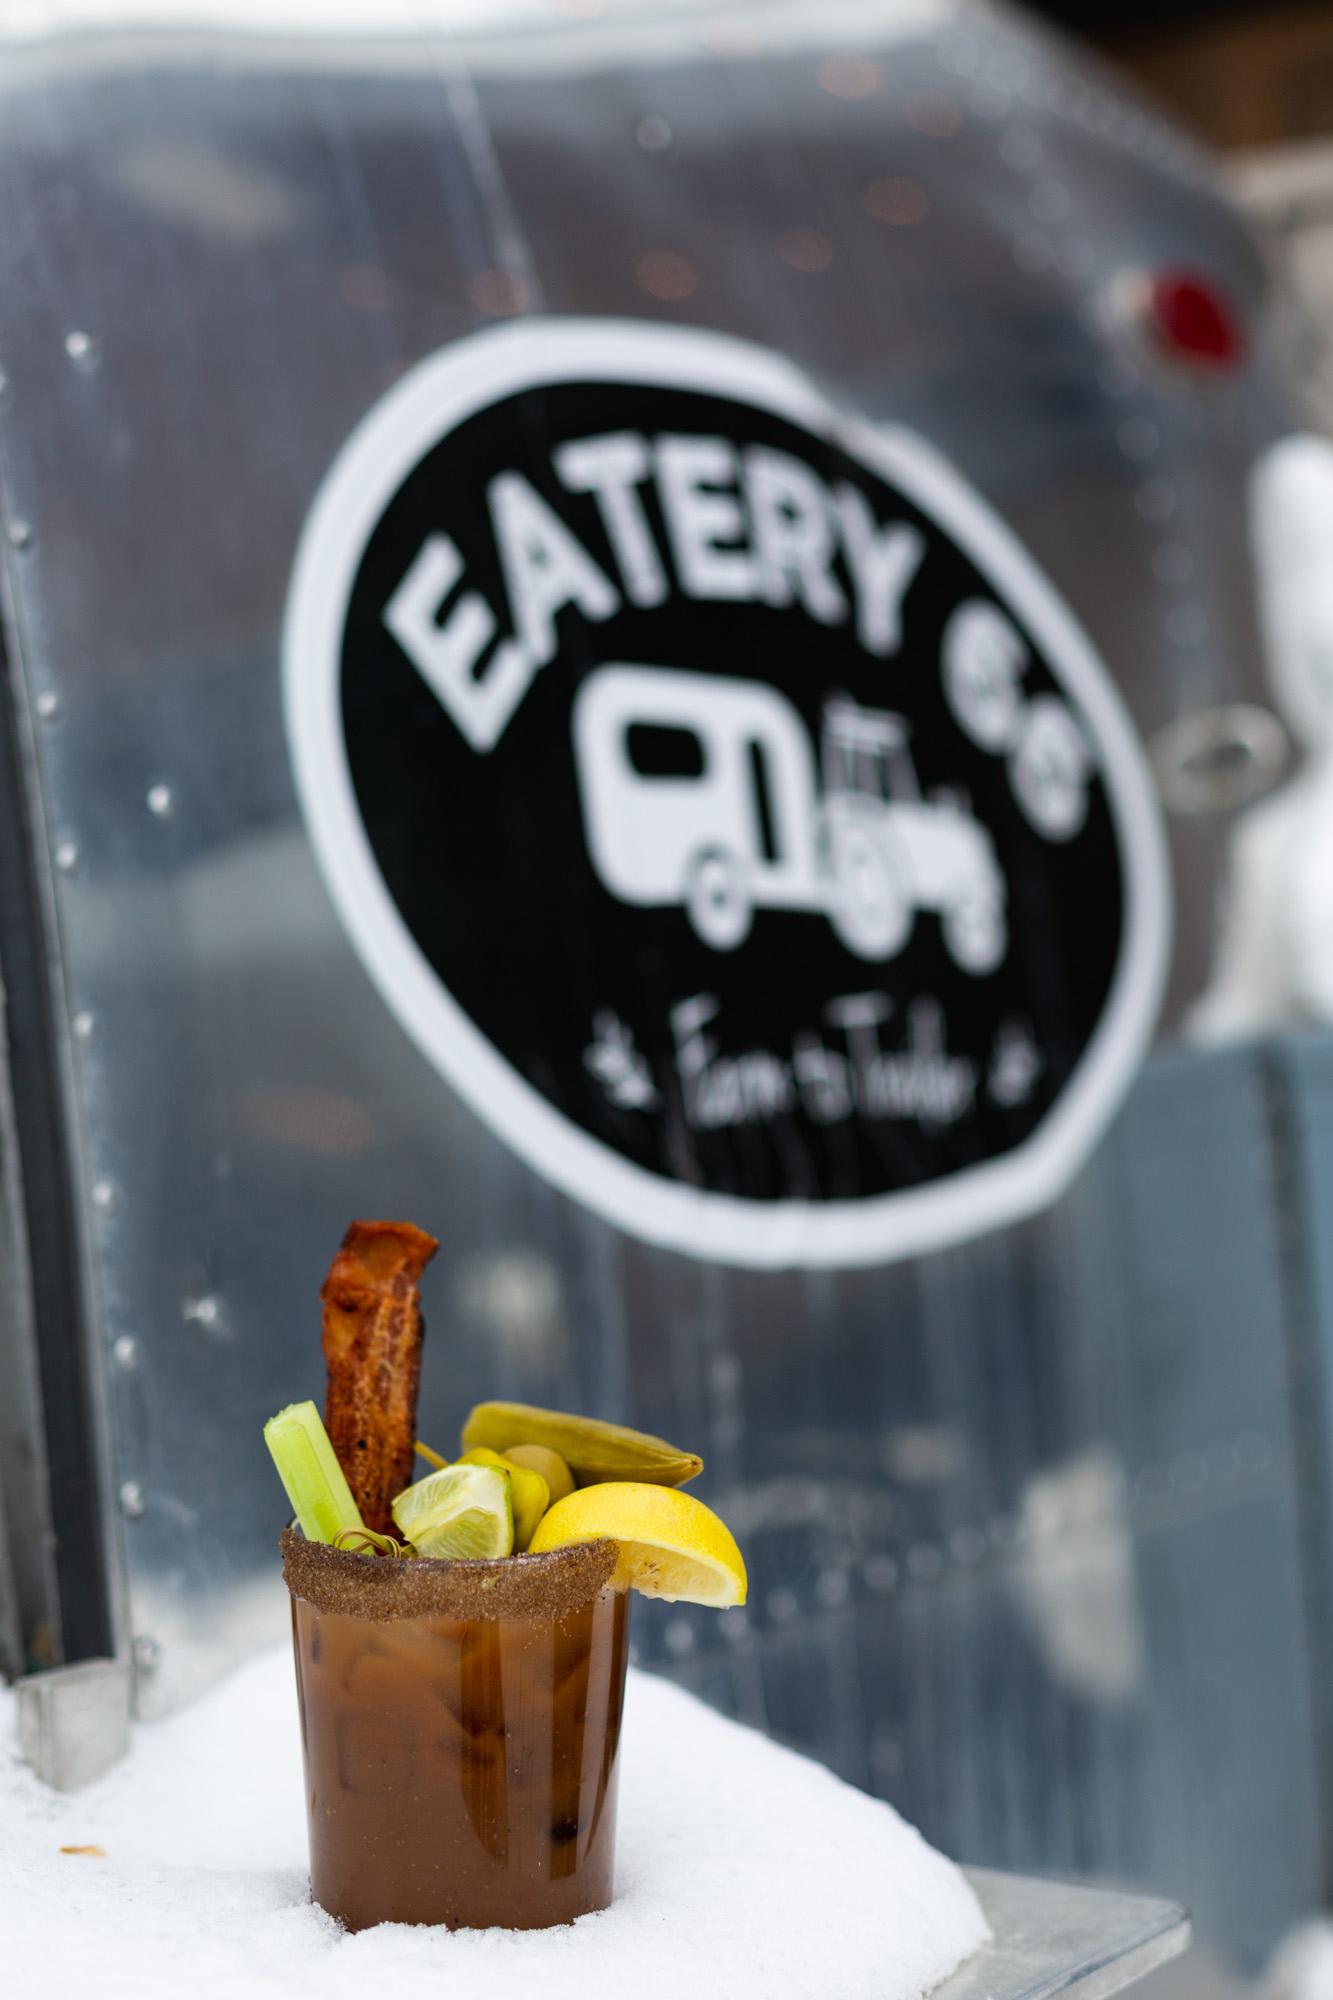 eatery-66-137.jpg